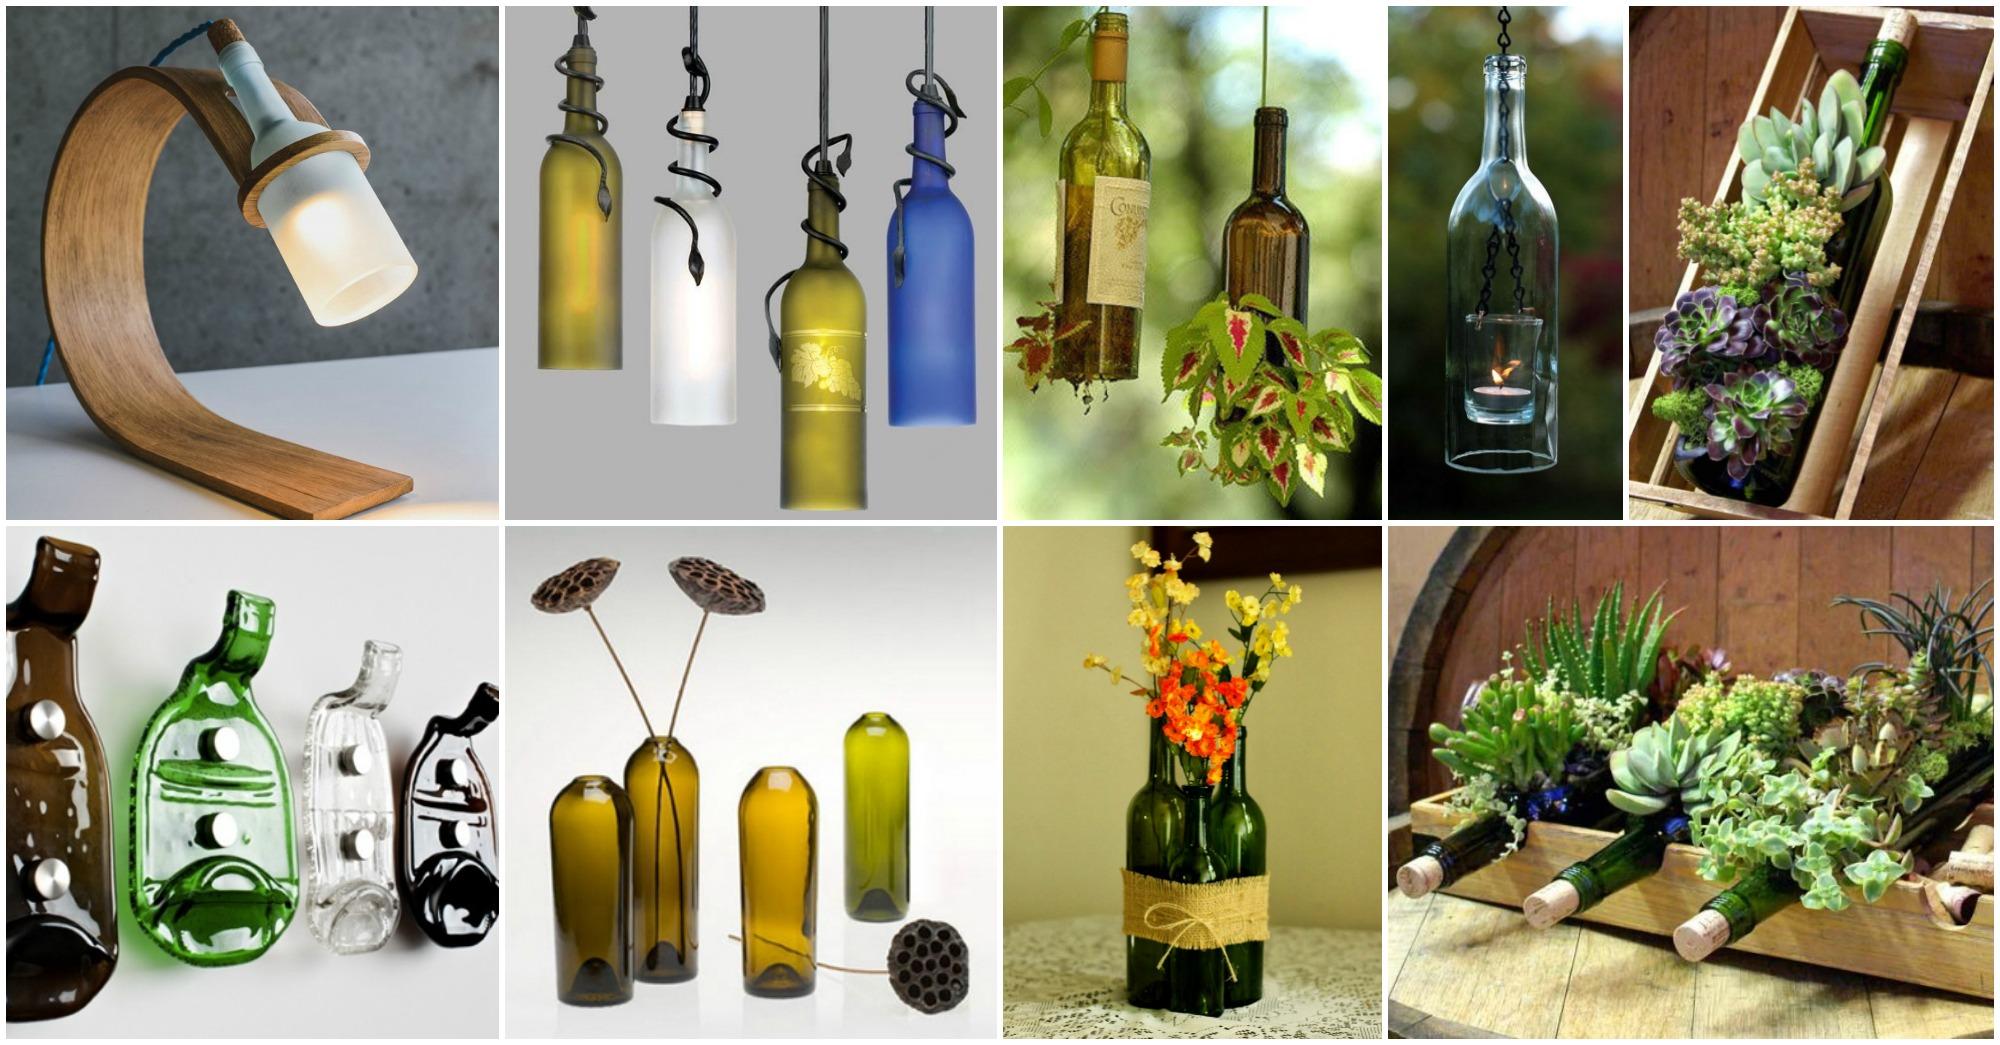 diy awesome bottle crafts